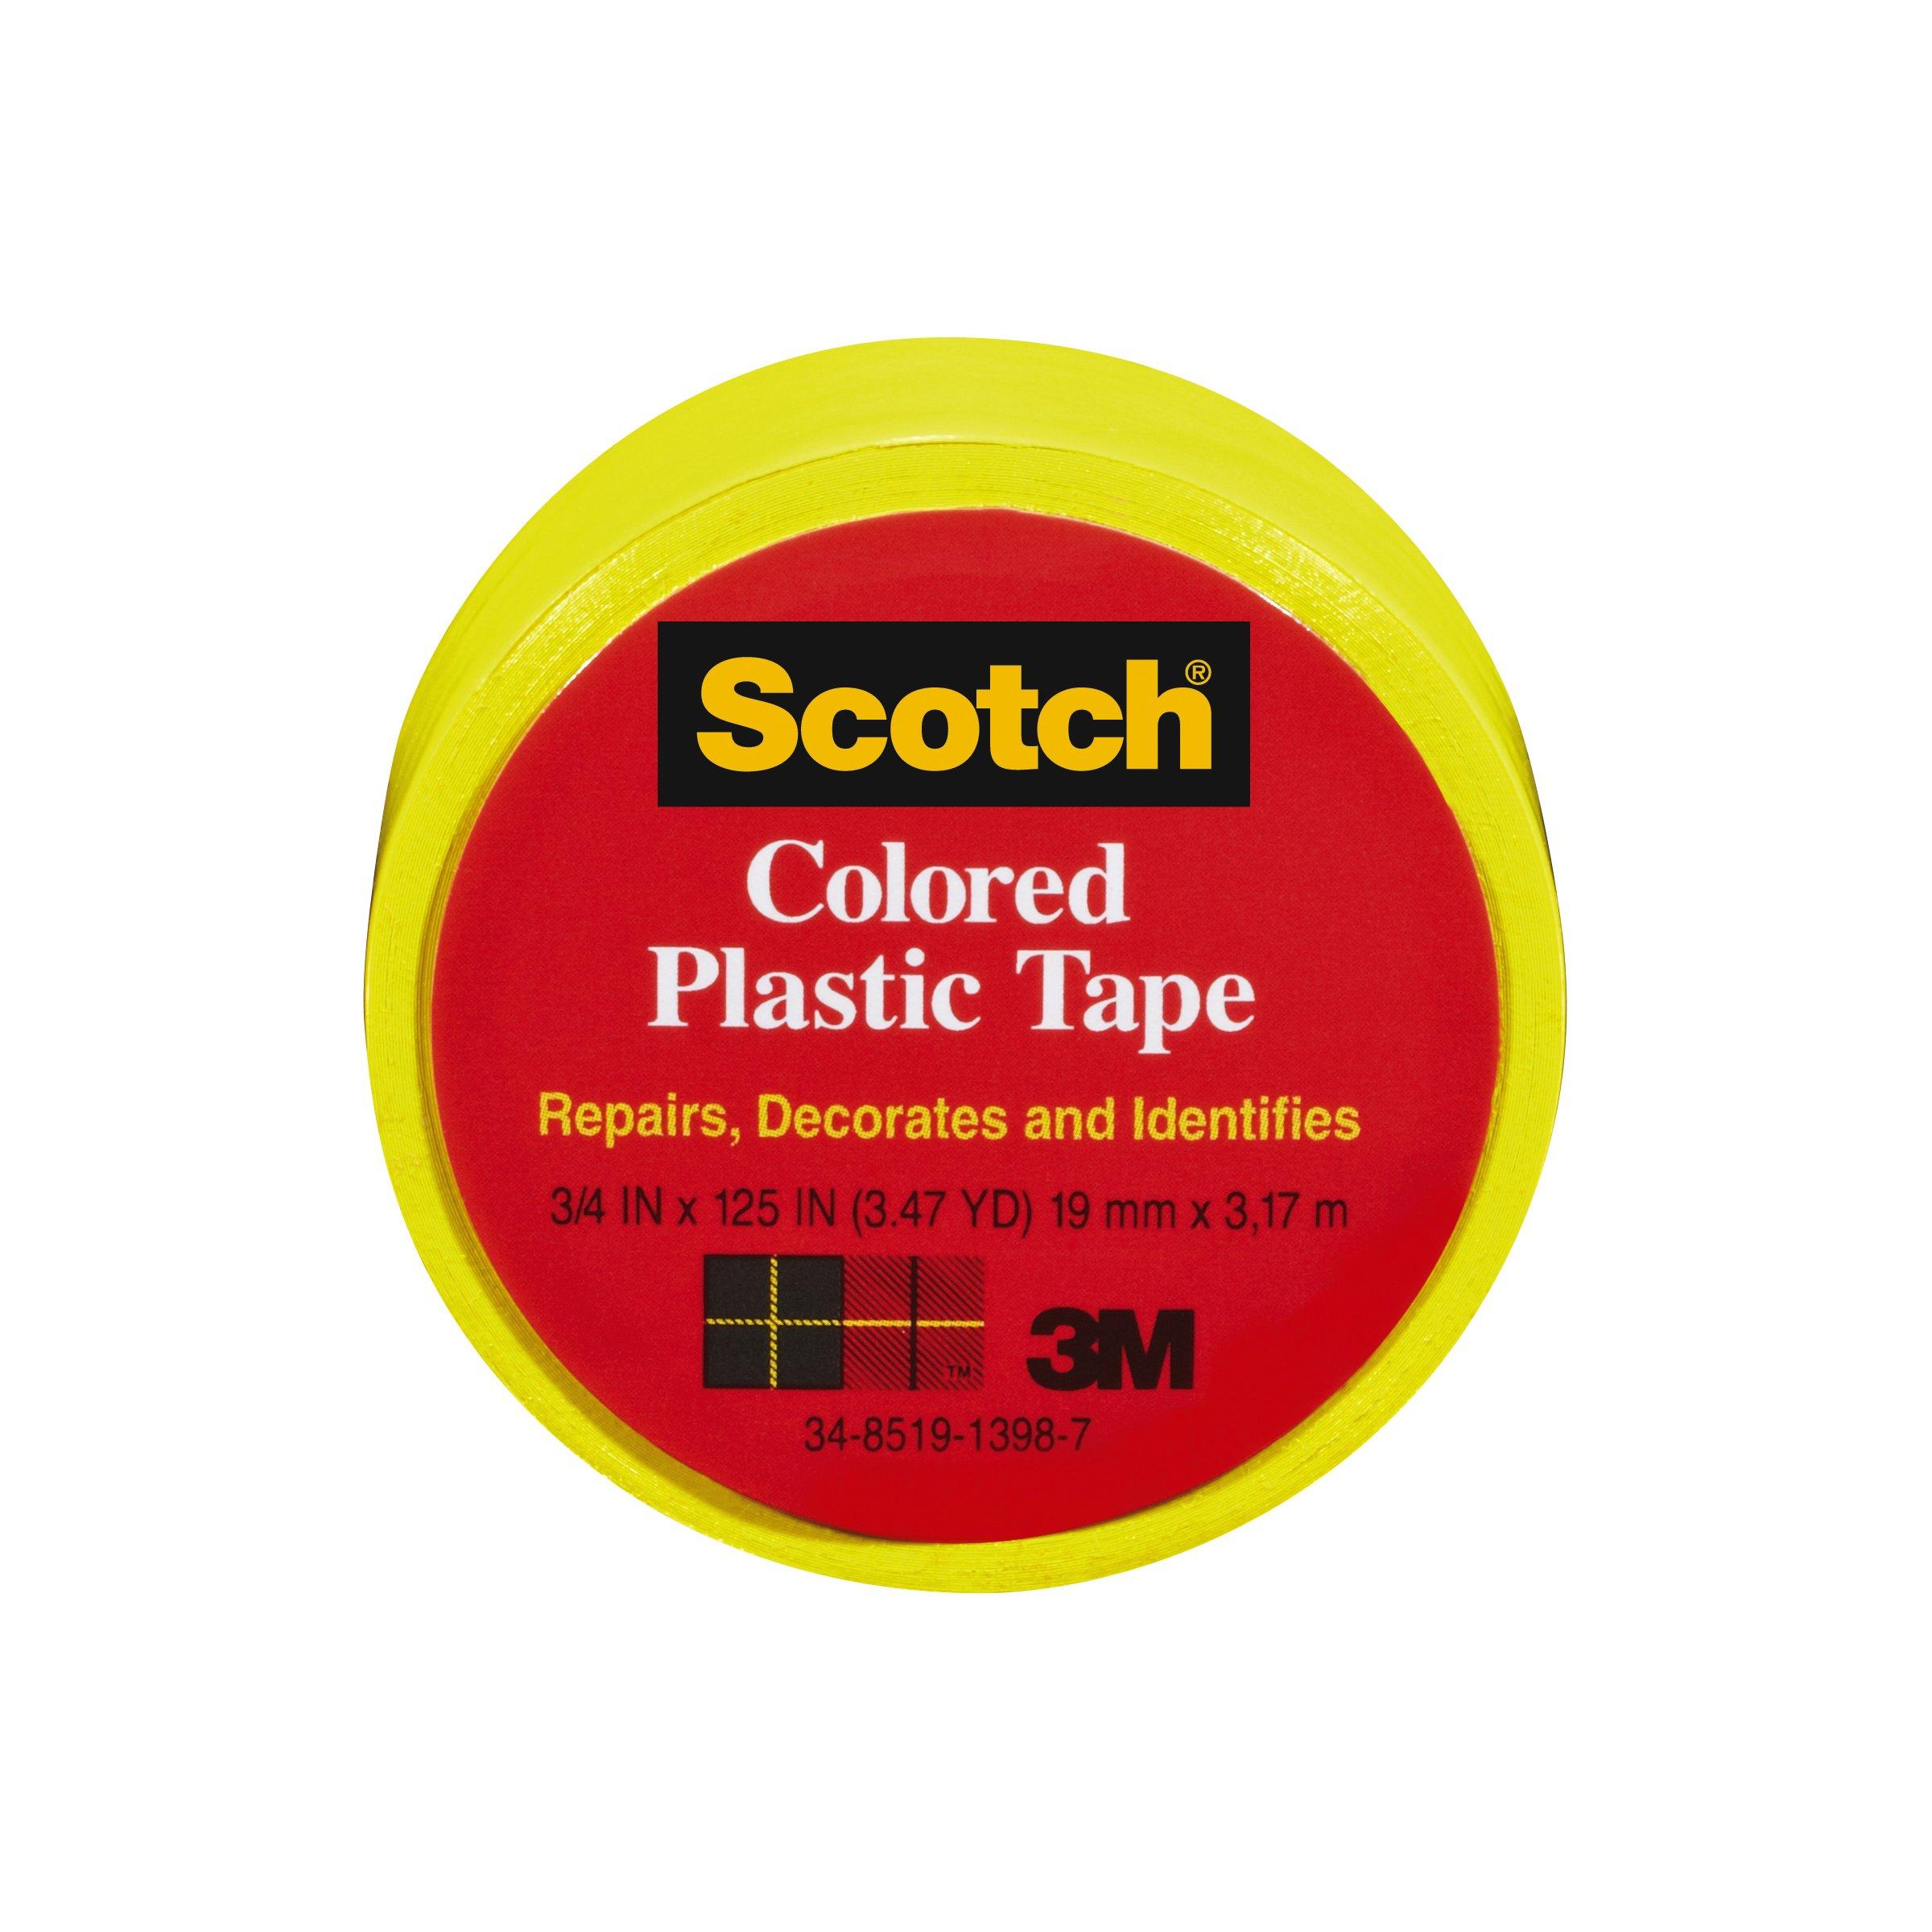 Scotch Scotch Colored Plastic Tape, Yellow, 3/4 x 125-Inch